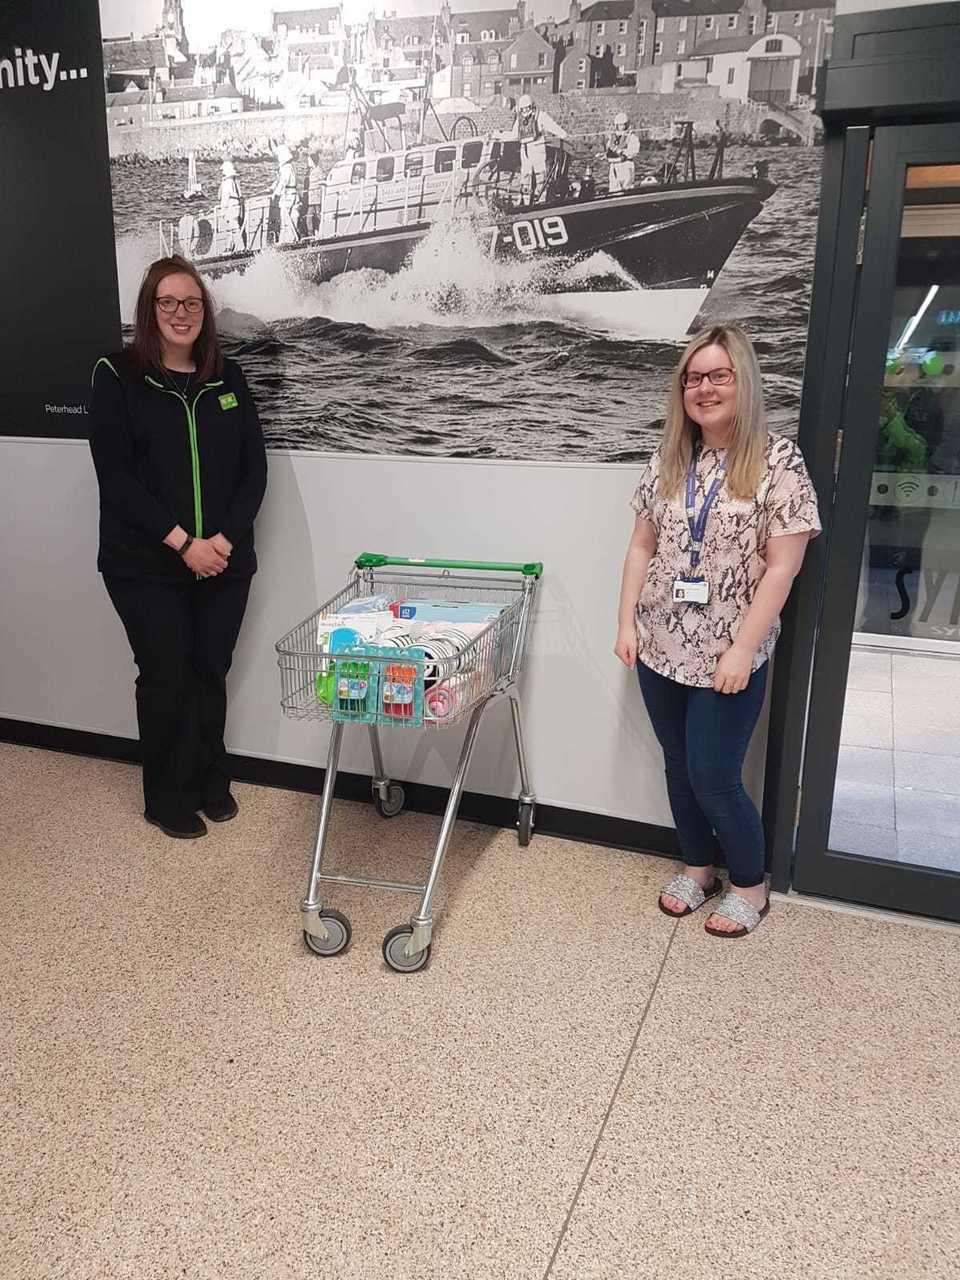 Donations to school | Asda Peterhead